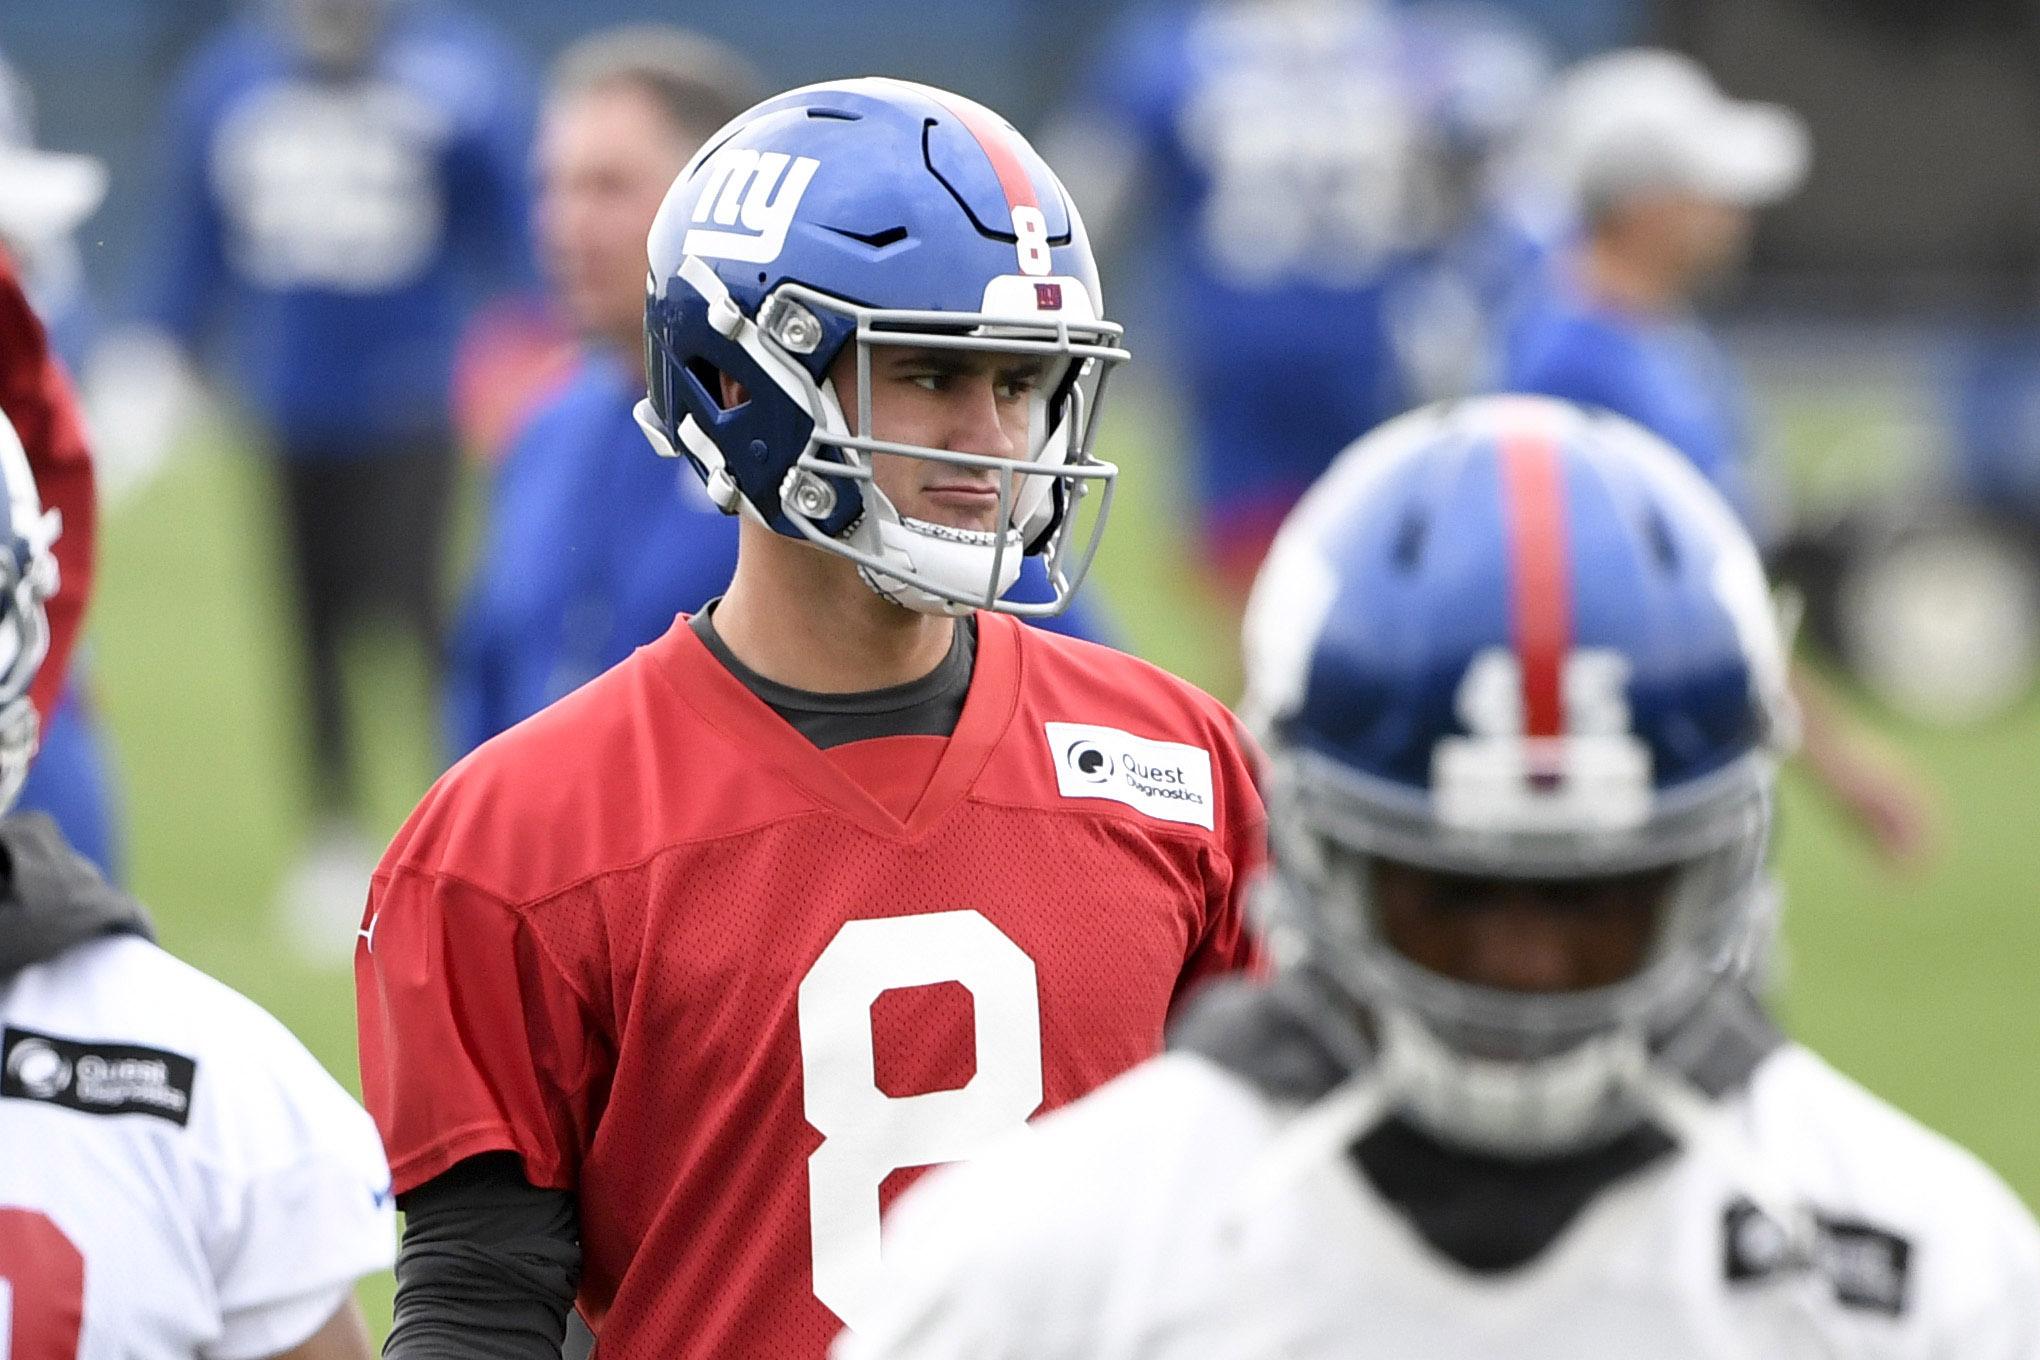 Giants rookie quarterback Daniel Jones booed at Yankee Stadium—for some reason